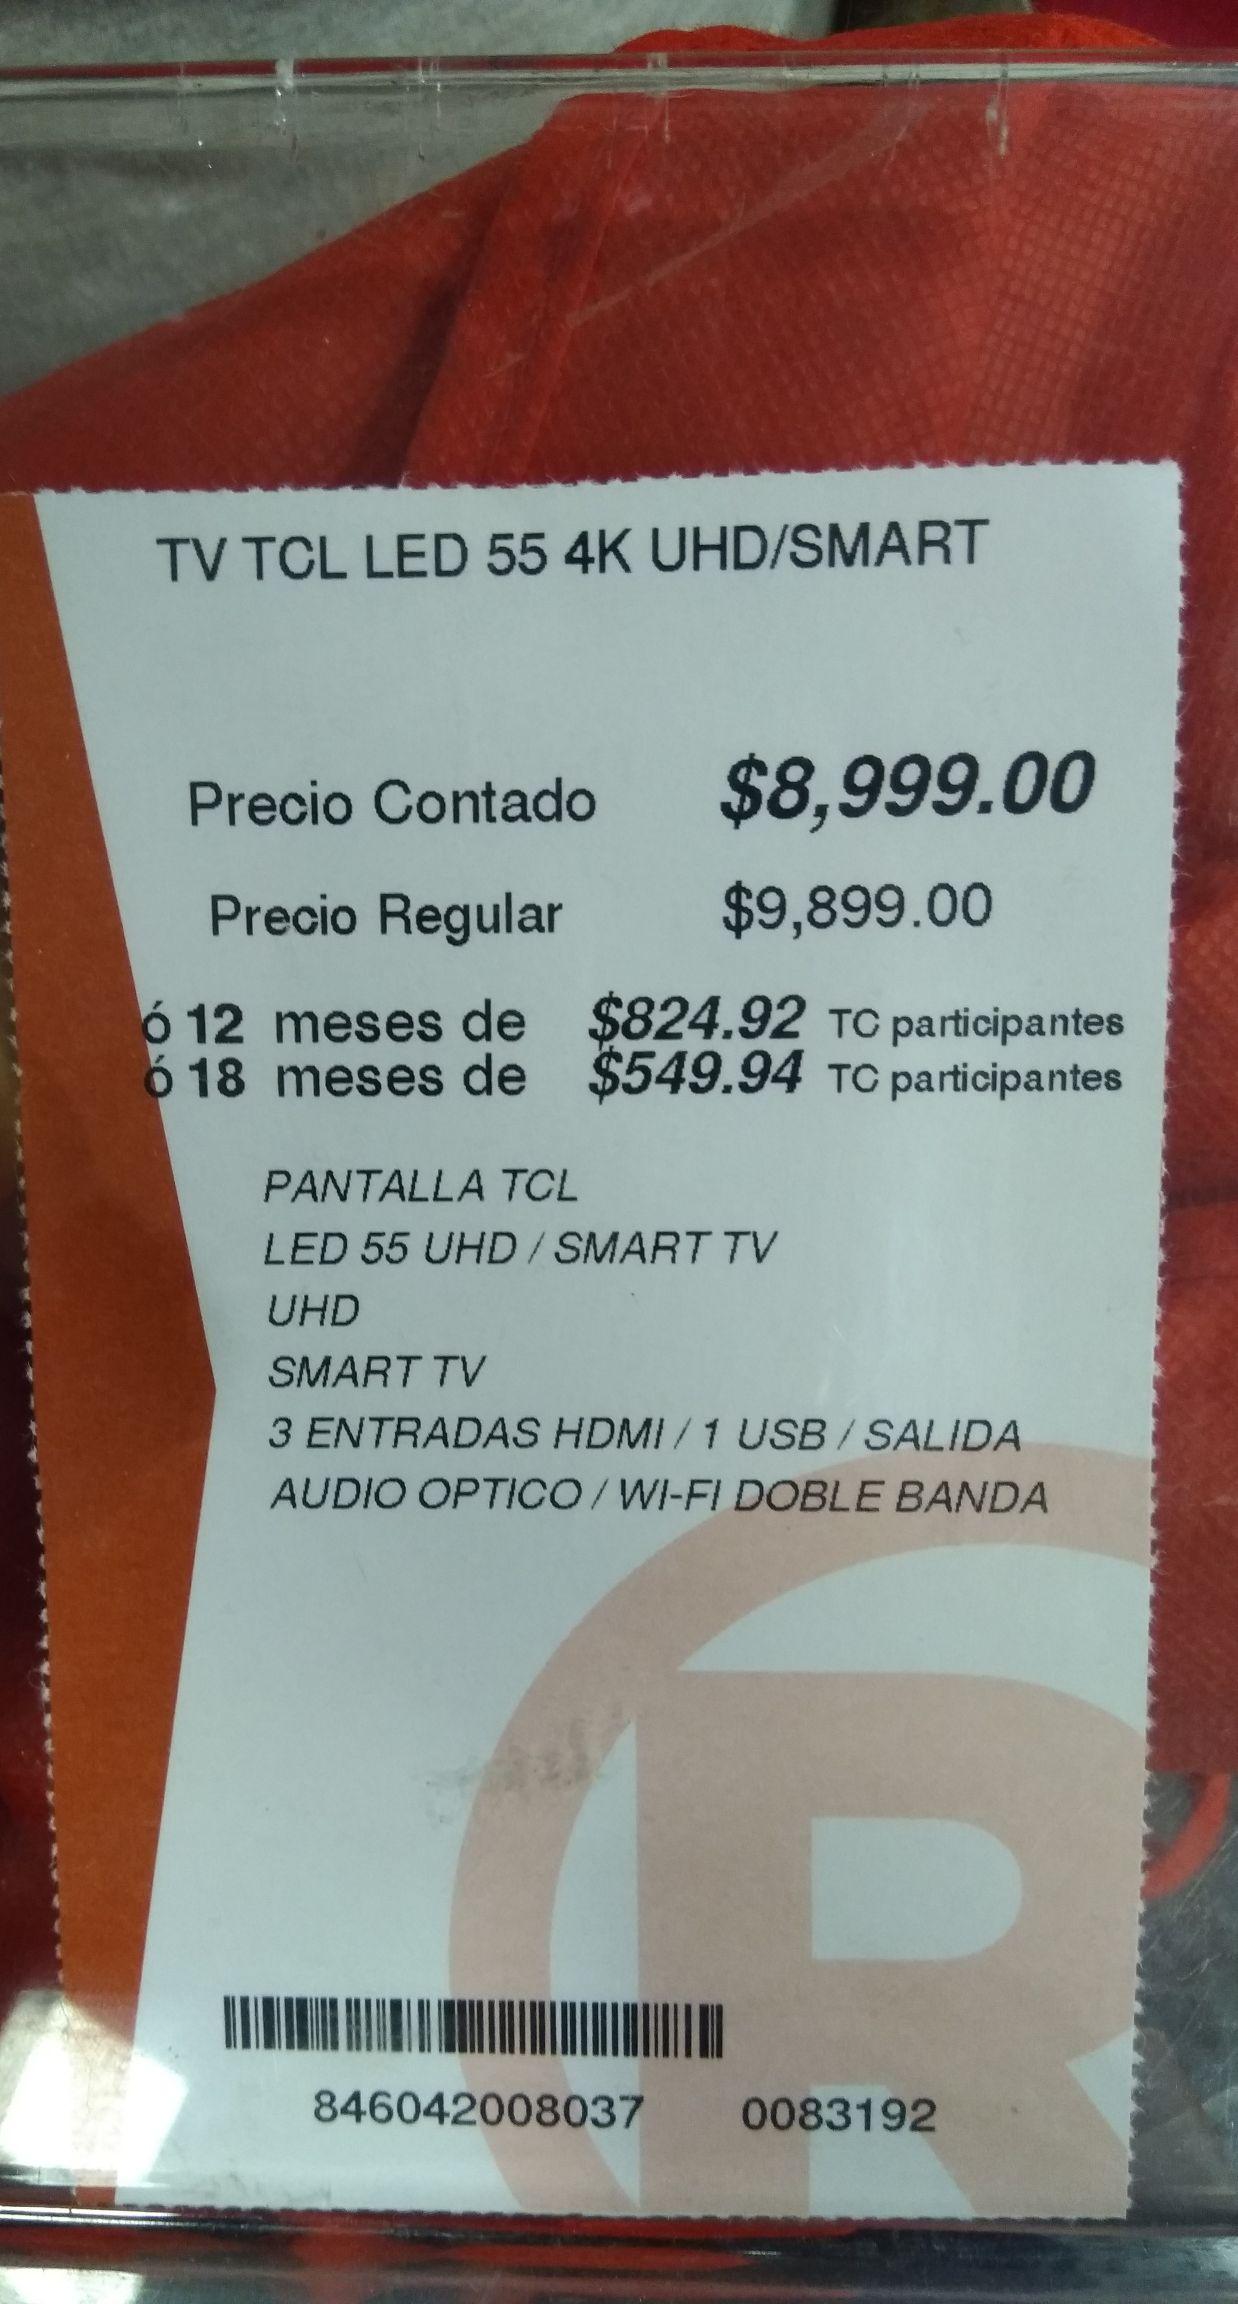 Radioshack: TCL 55 Roku 4k 120  55S405 + luces Bluetooth de regalo